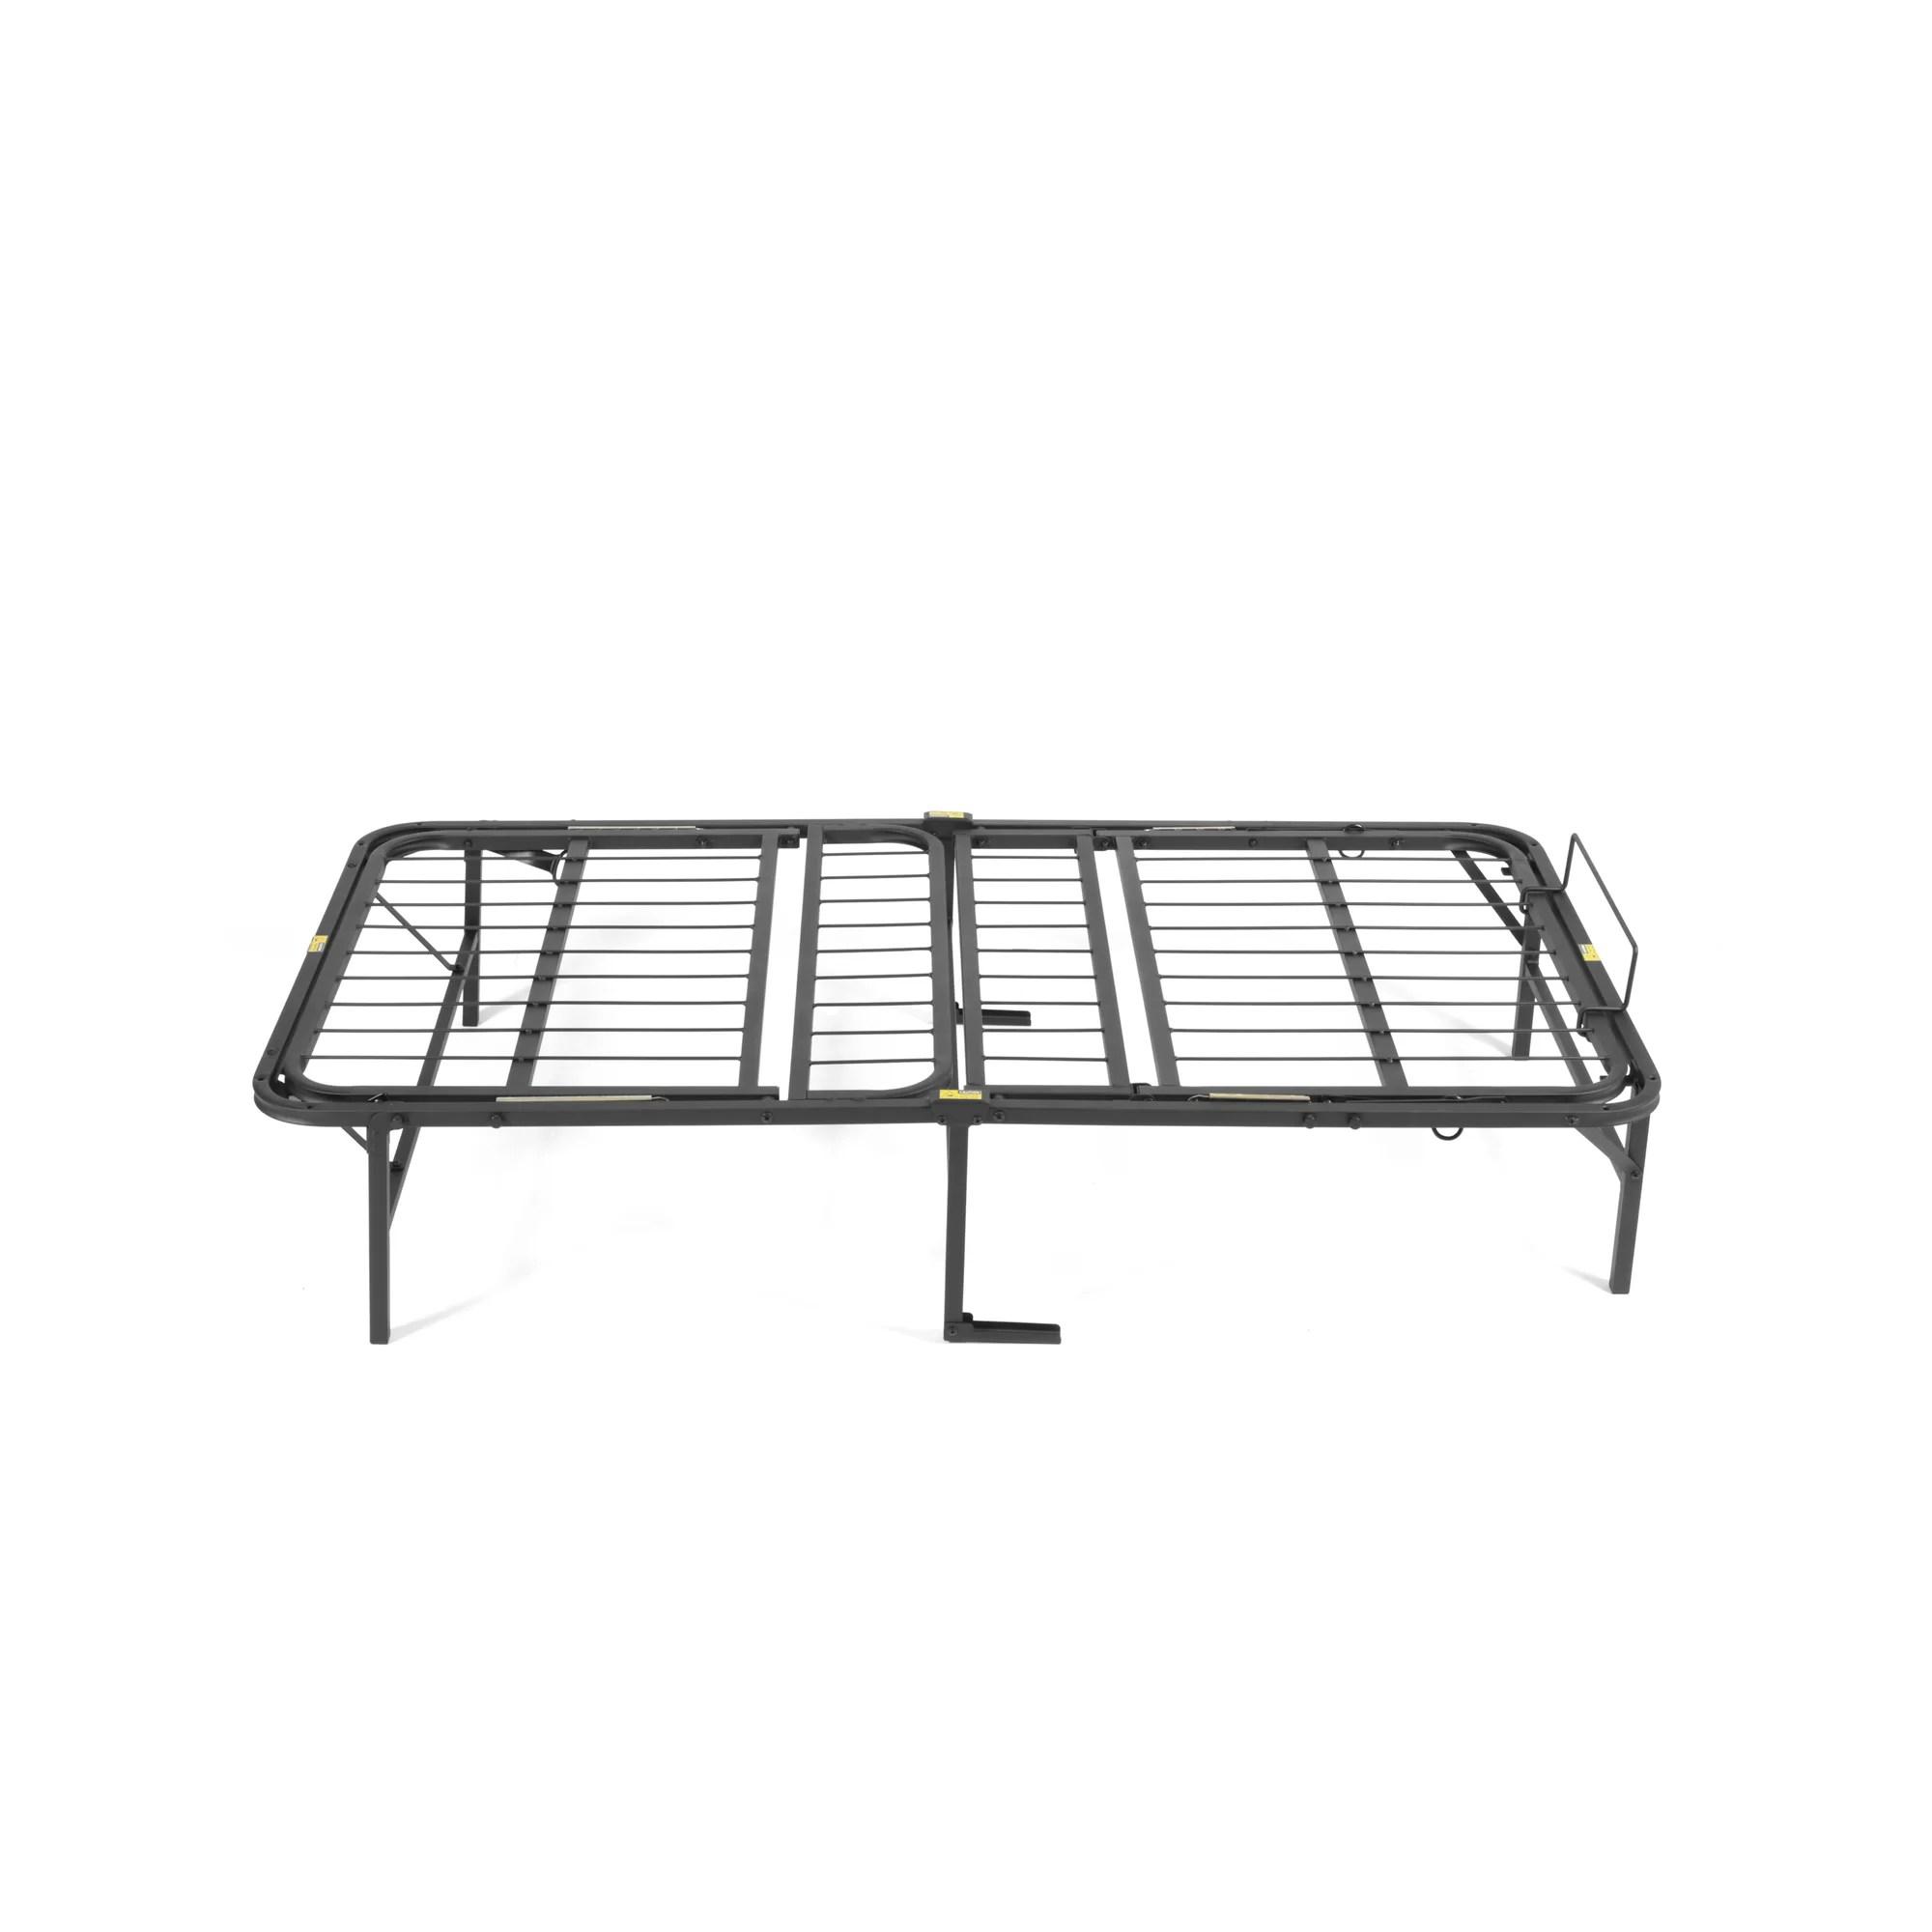 Pragma Bed Simple Adjust Bed Frame Amp Reviews